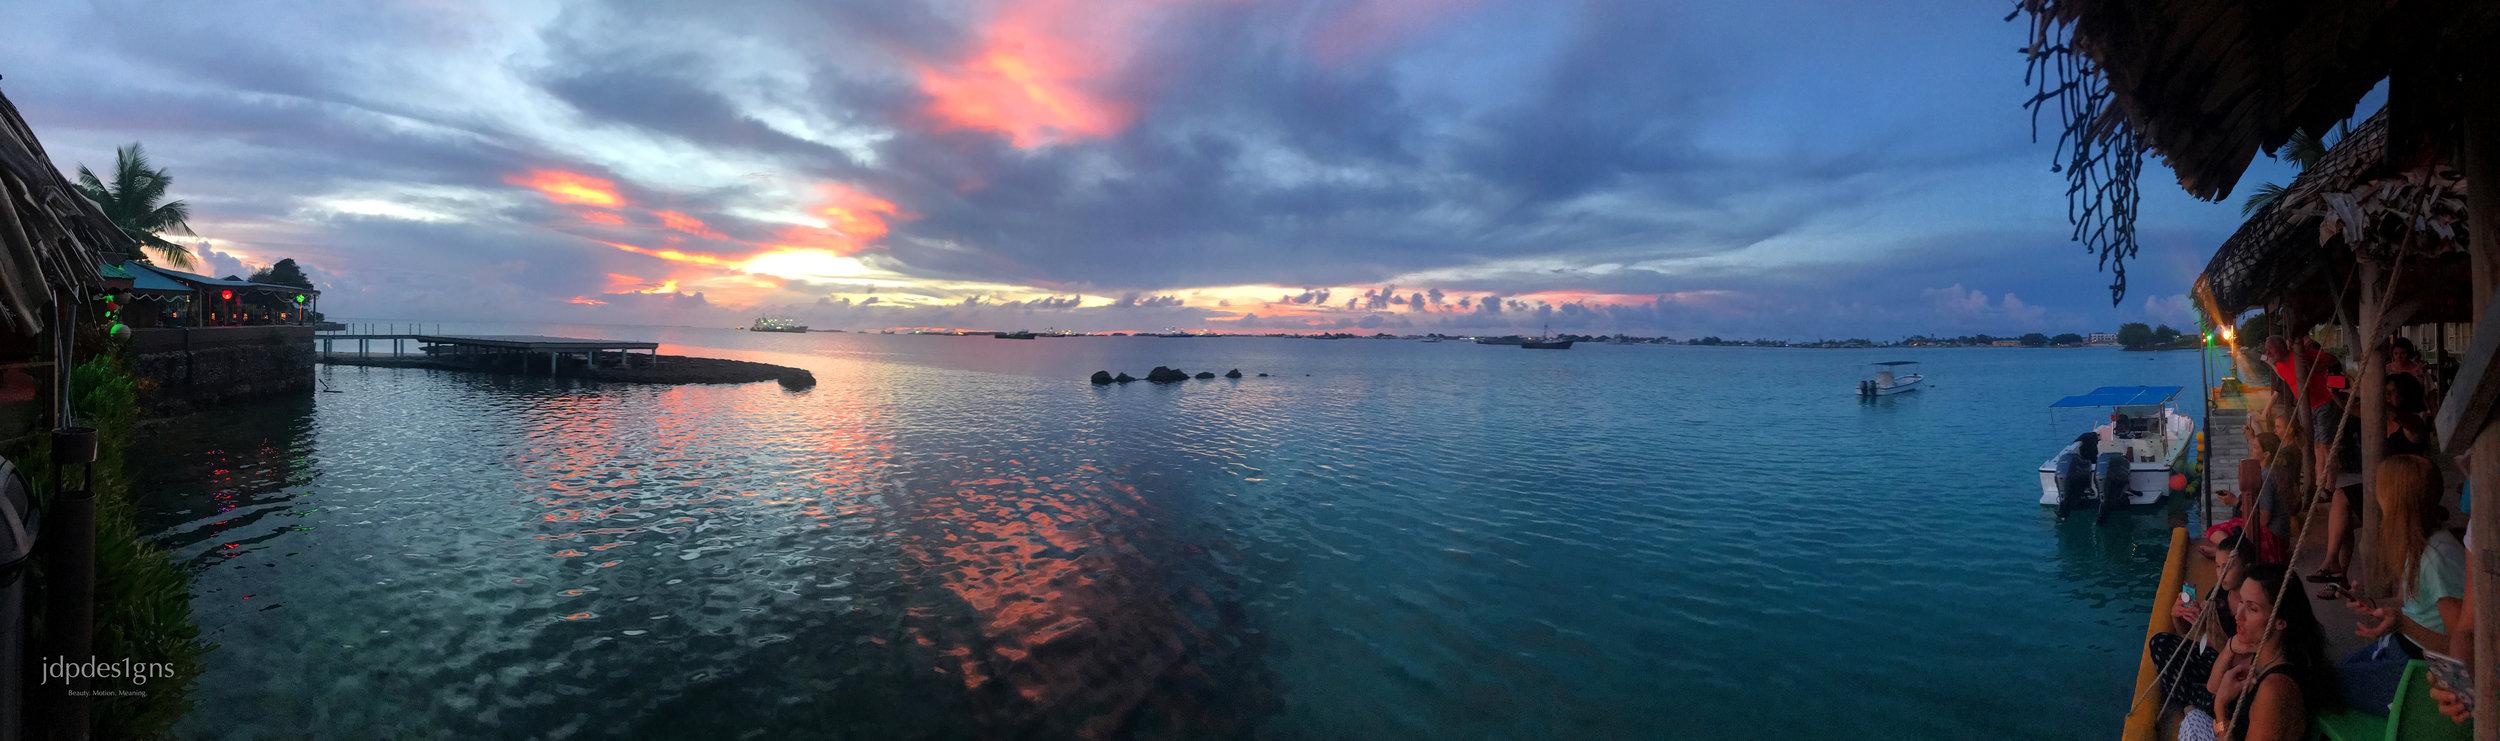 Lagoon Sunset Pano Resize.jpg